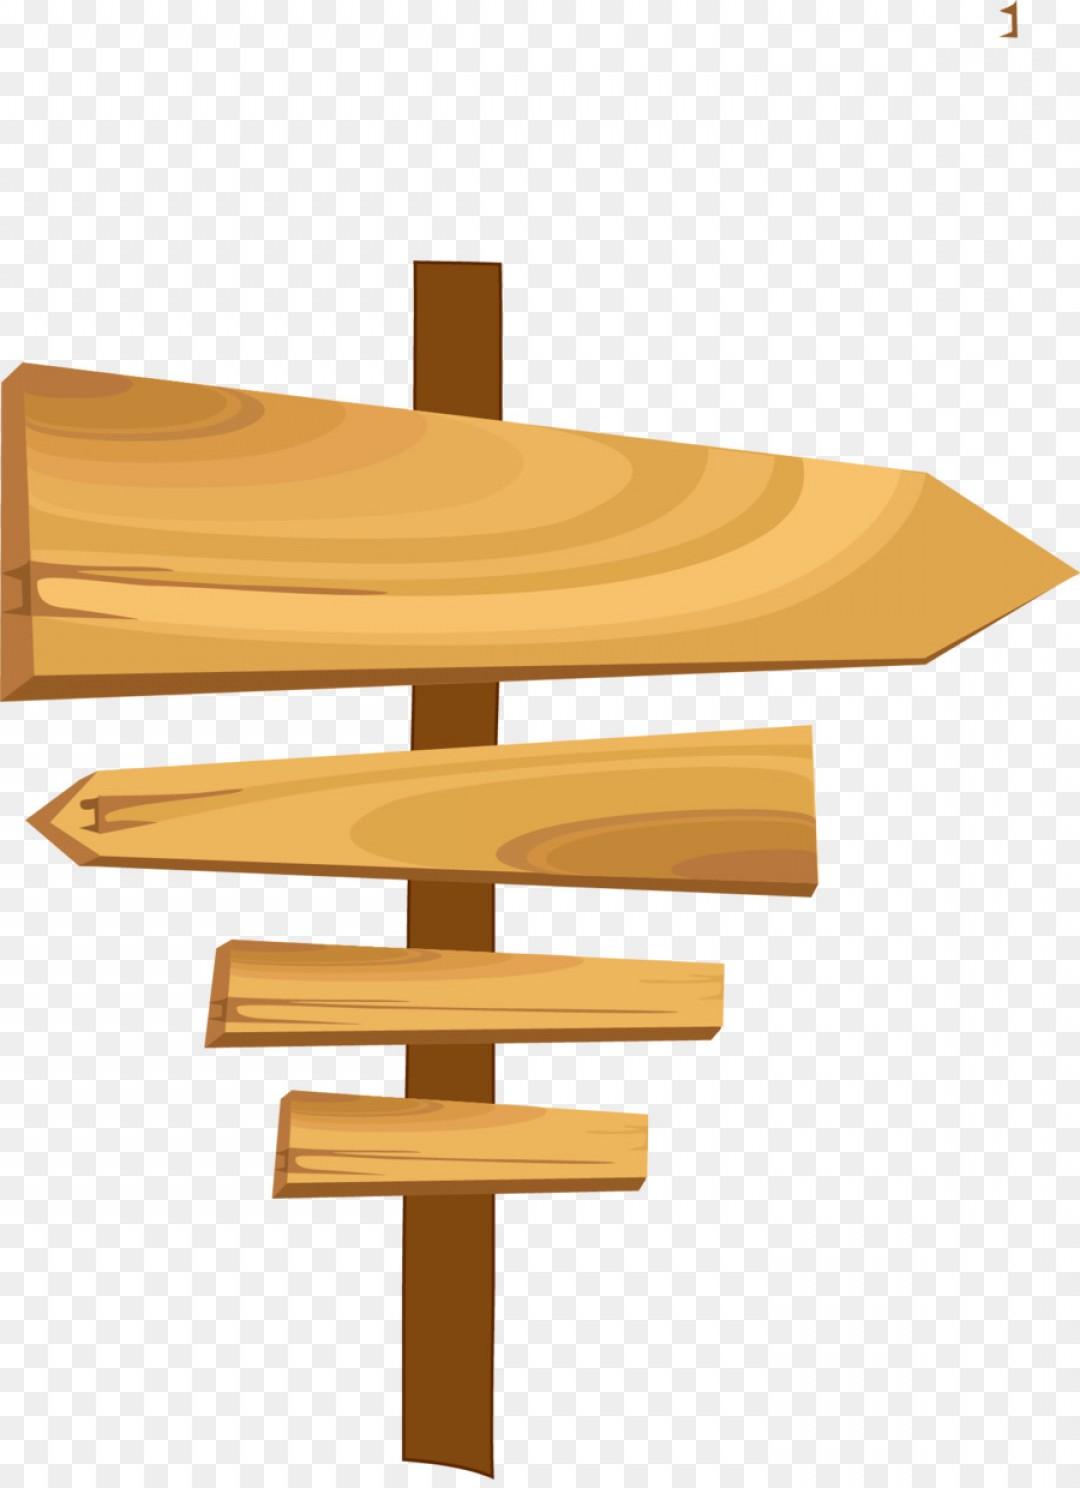 Euclidean vector clipart svg royalty free library Png Wood Euclidean Vector Clip Art Wood Signs Vector M | SOIDERGI svg royalty free library